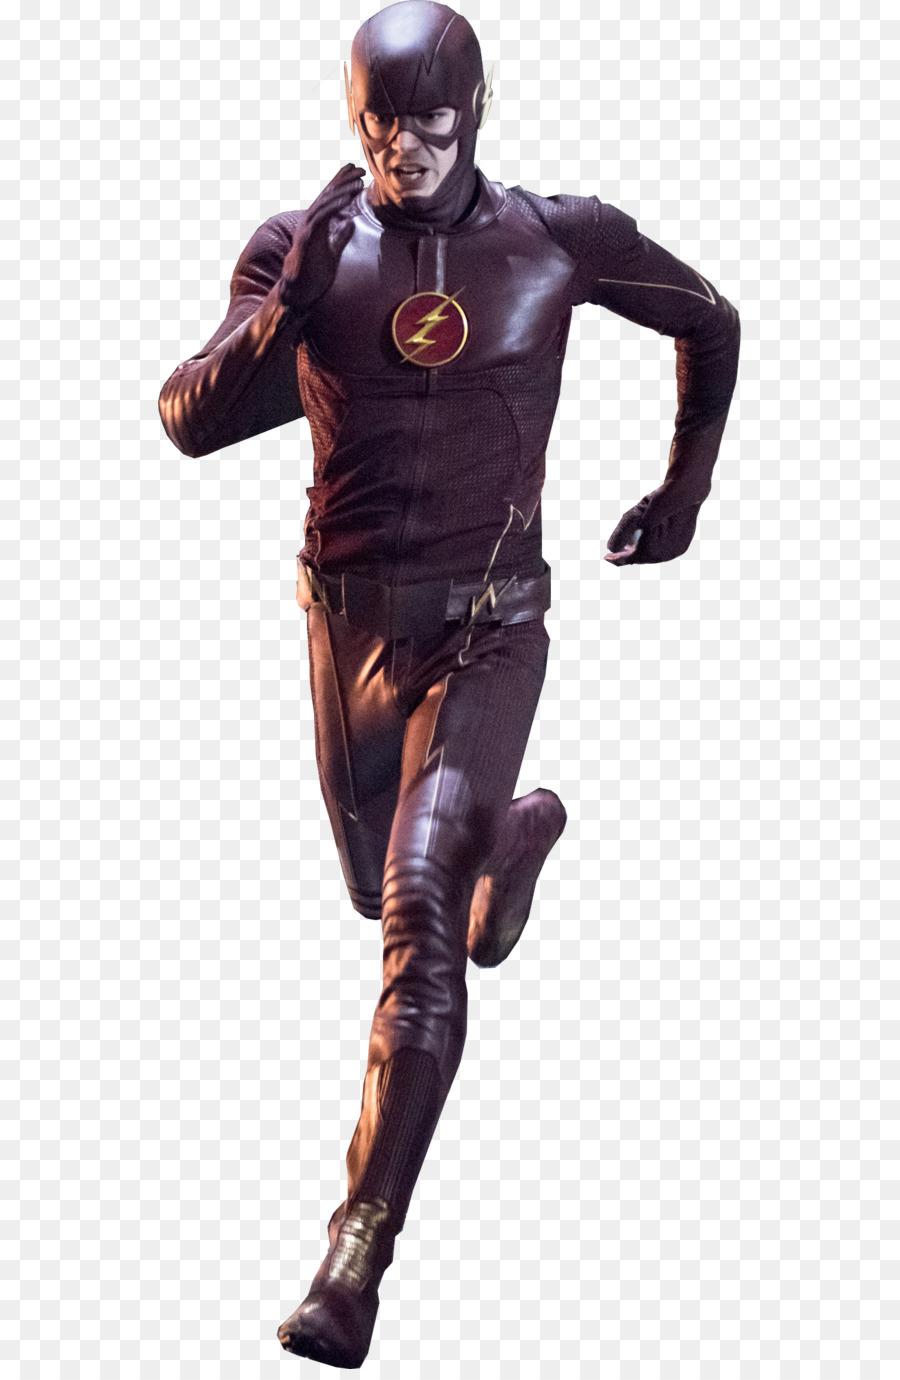 The Flash Clip art - krrish